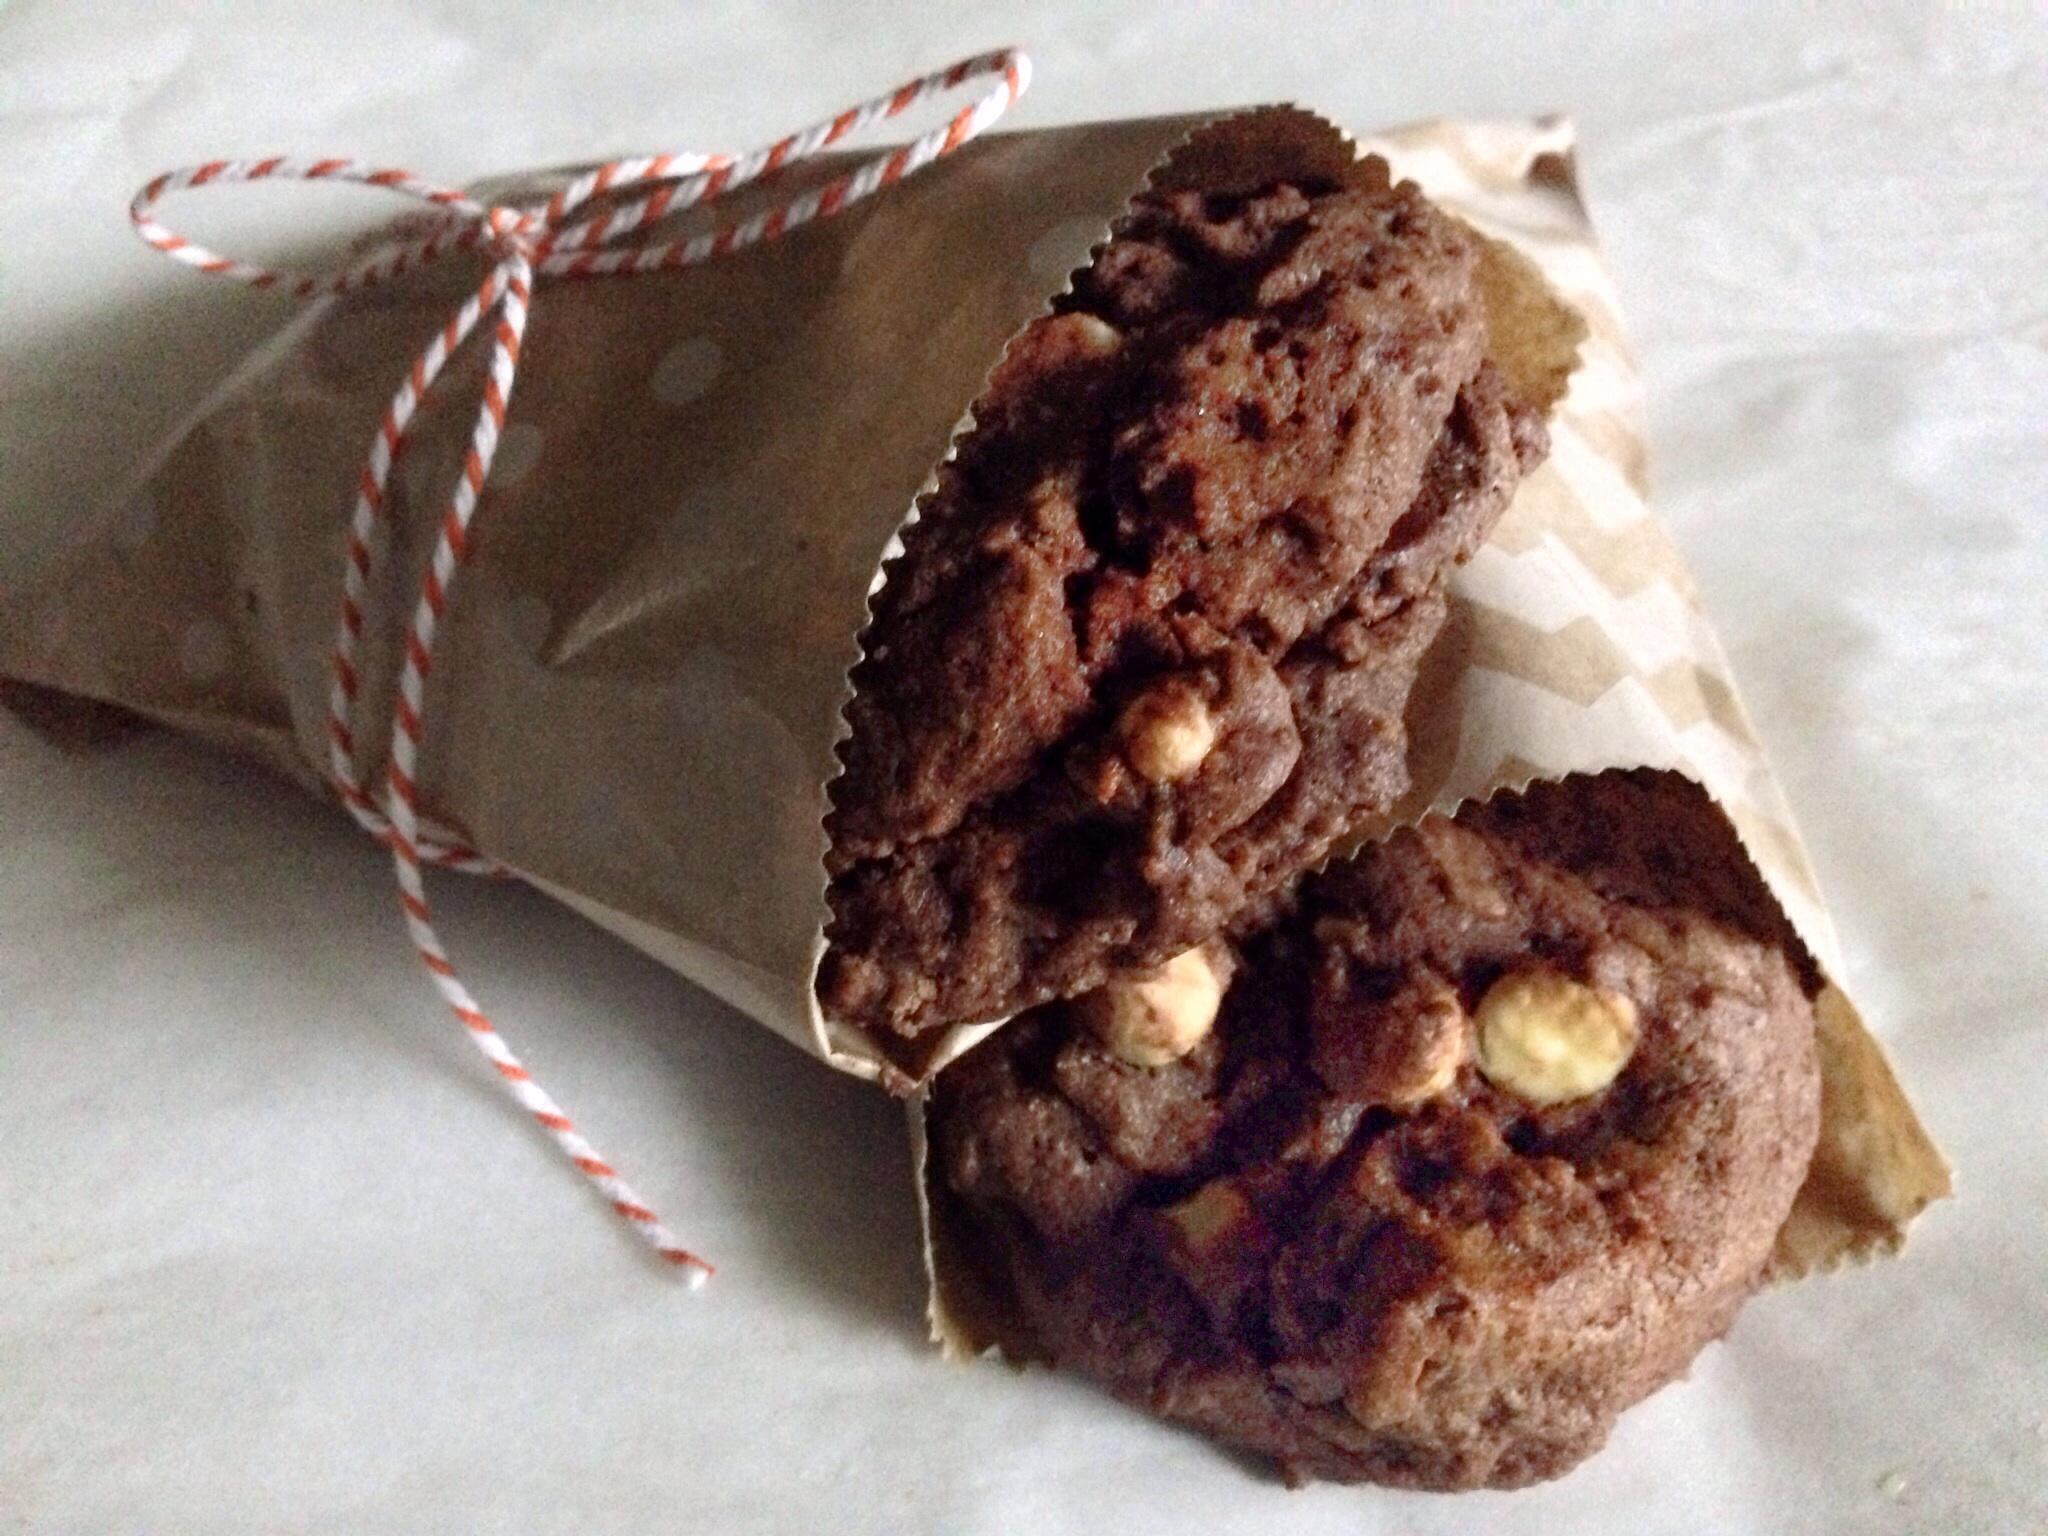 Giant Triple Chocolate Chocolate Chip Cookies